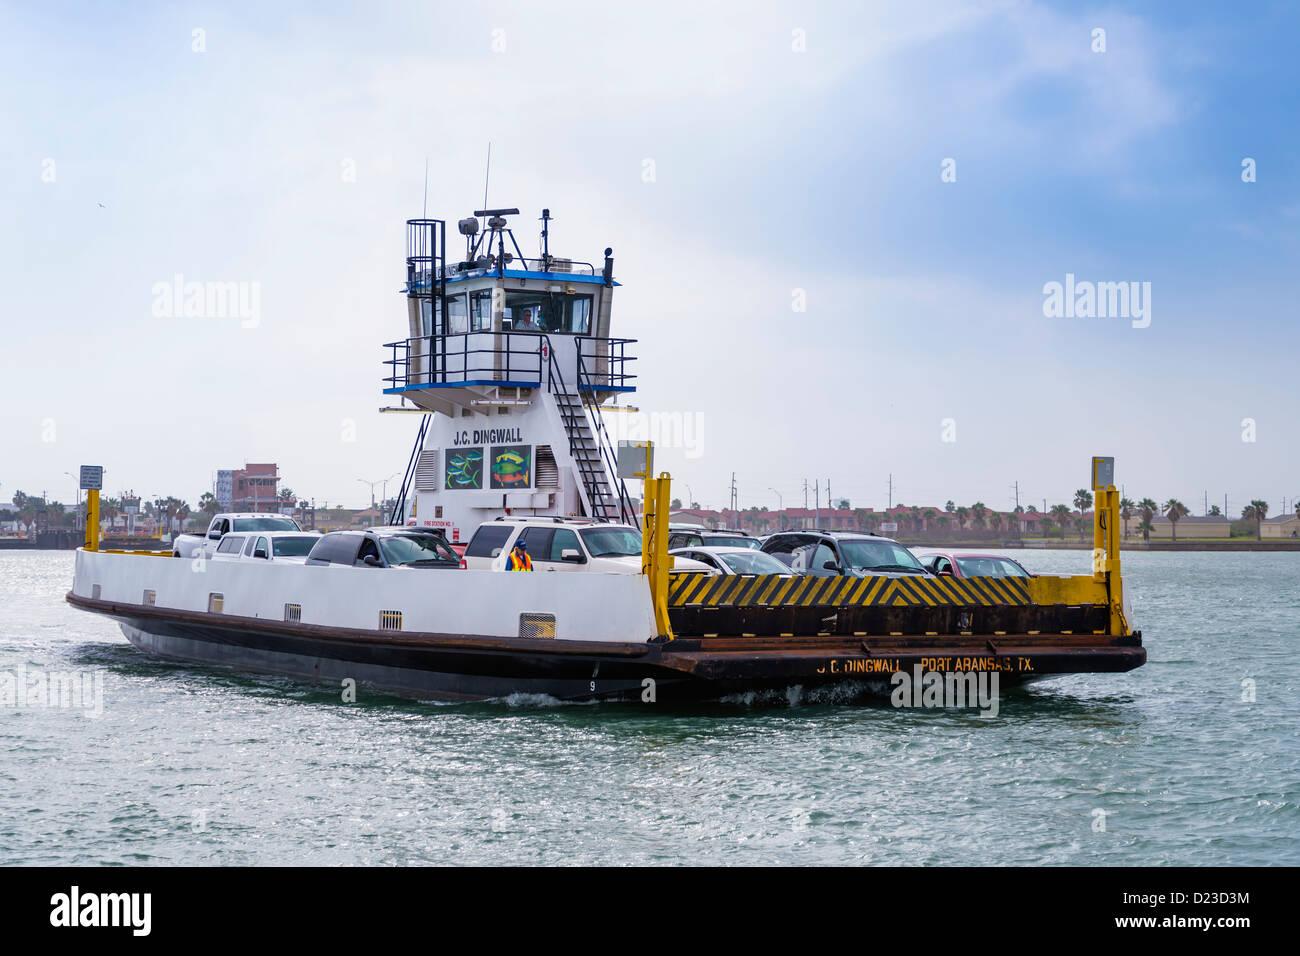 Ferry from Port Aransas, Mustang Island to Aransas Pass, Texas, USA - Stock Image